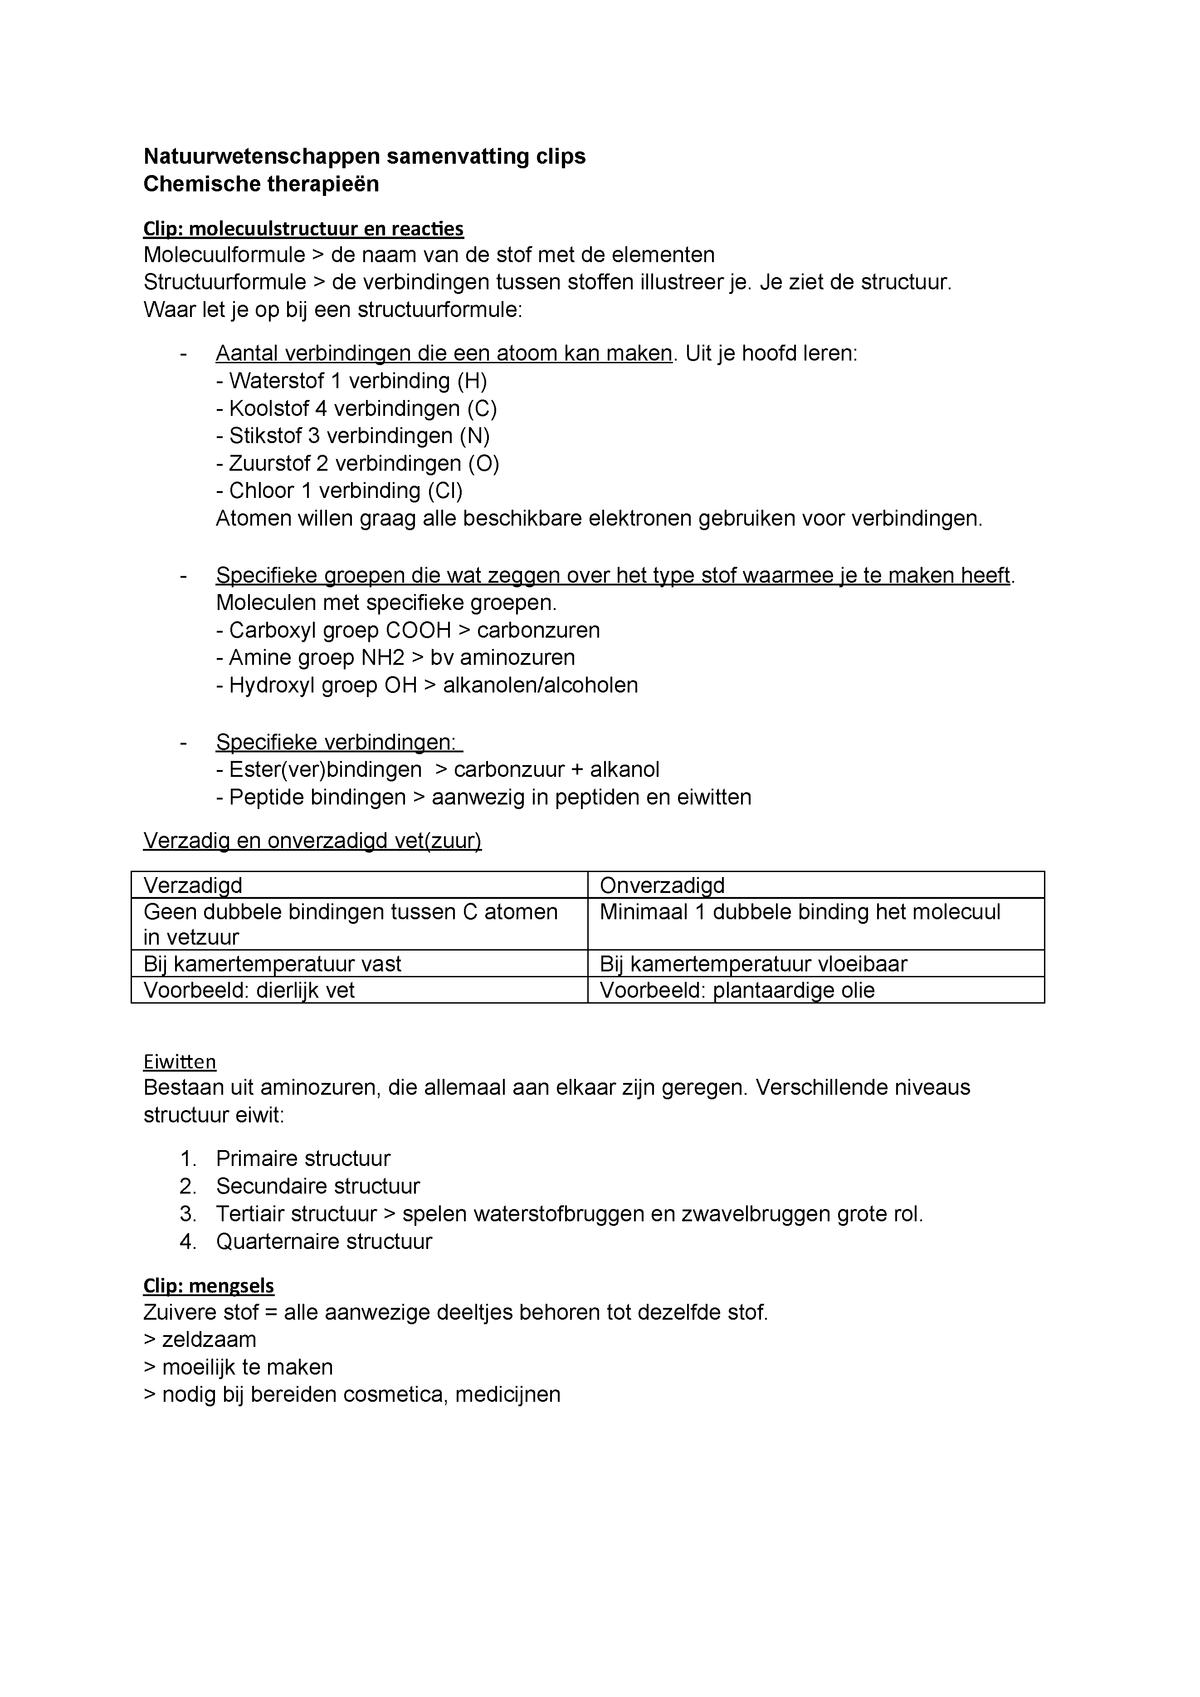 Sv Clips Chemische Therapieën Hhs Huid 018 Studeersnelnl